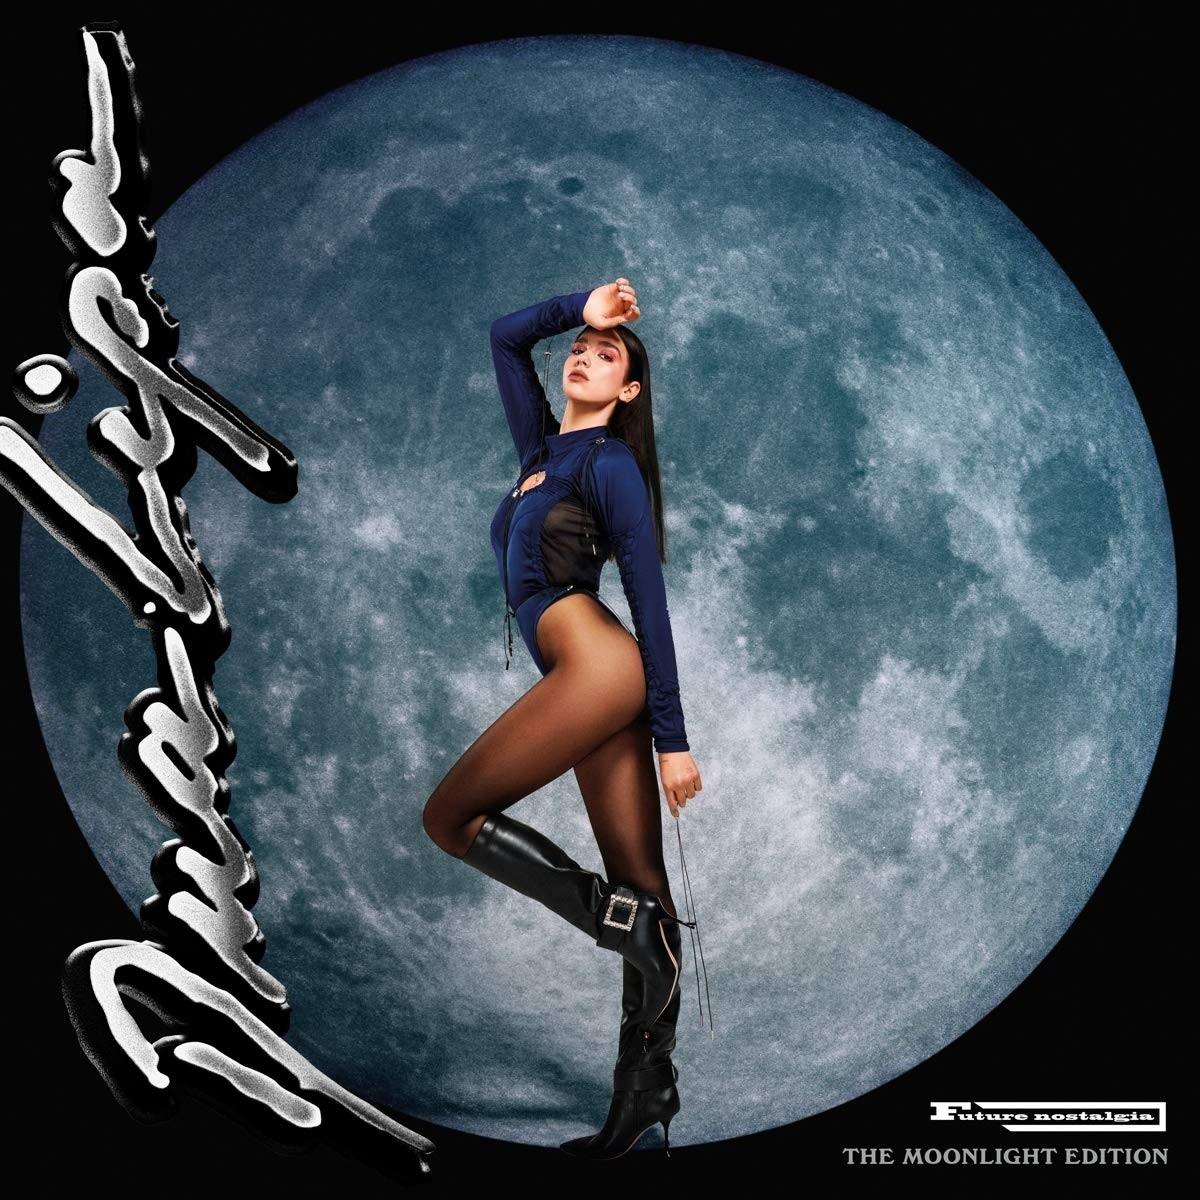 Dua Lipa - Future Nostalgia (The Moonlight Edition) 2XLP Vinyl